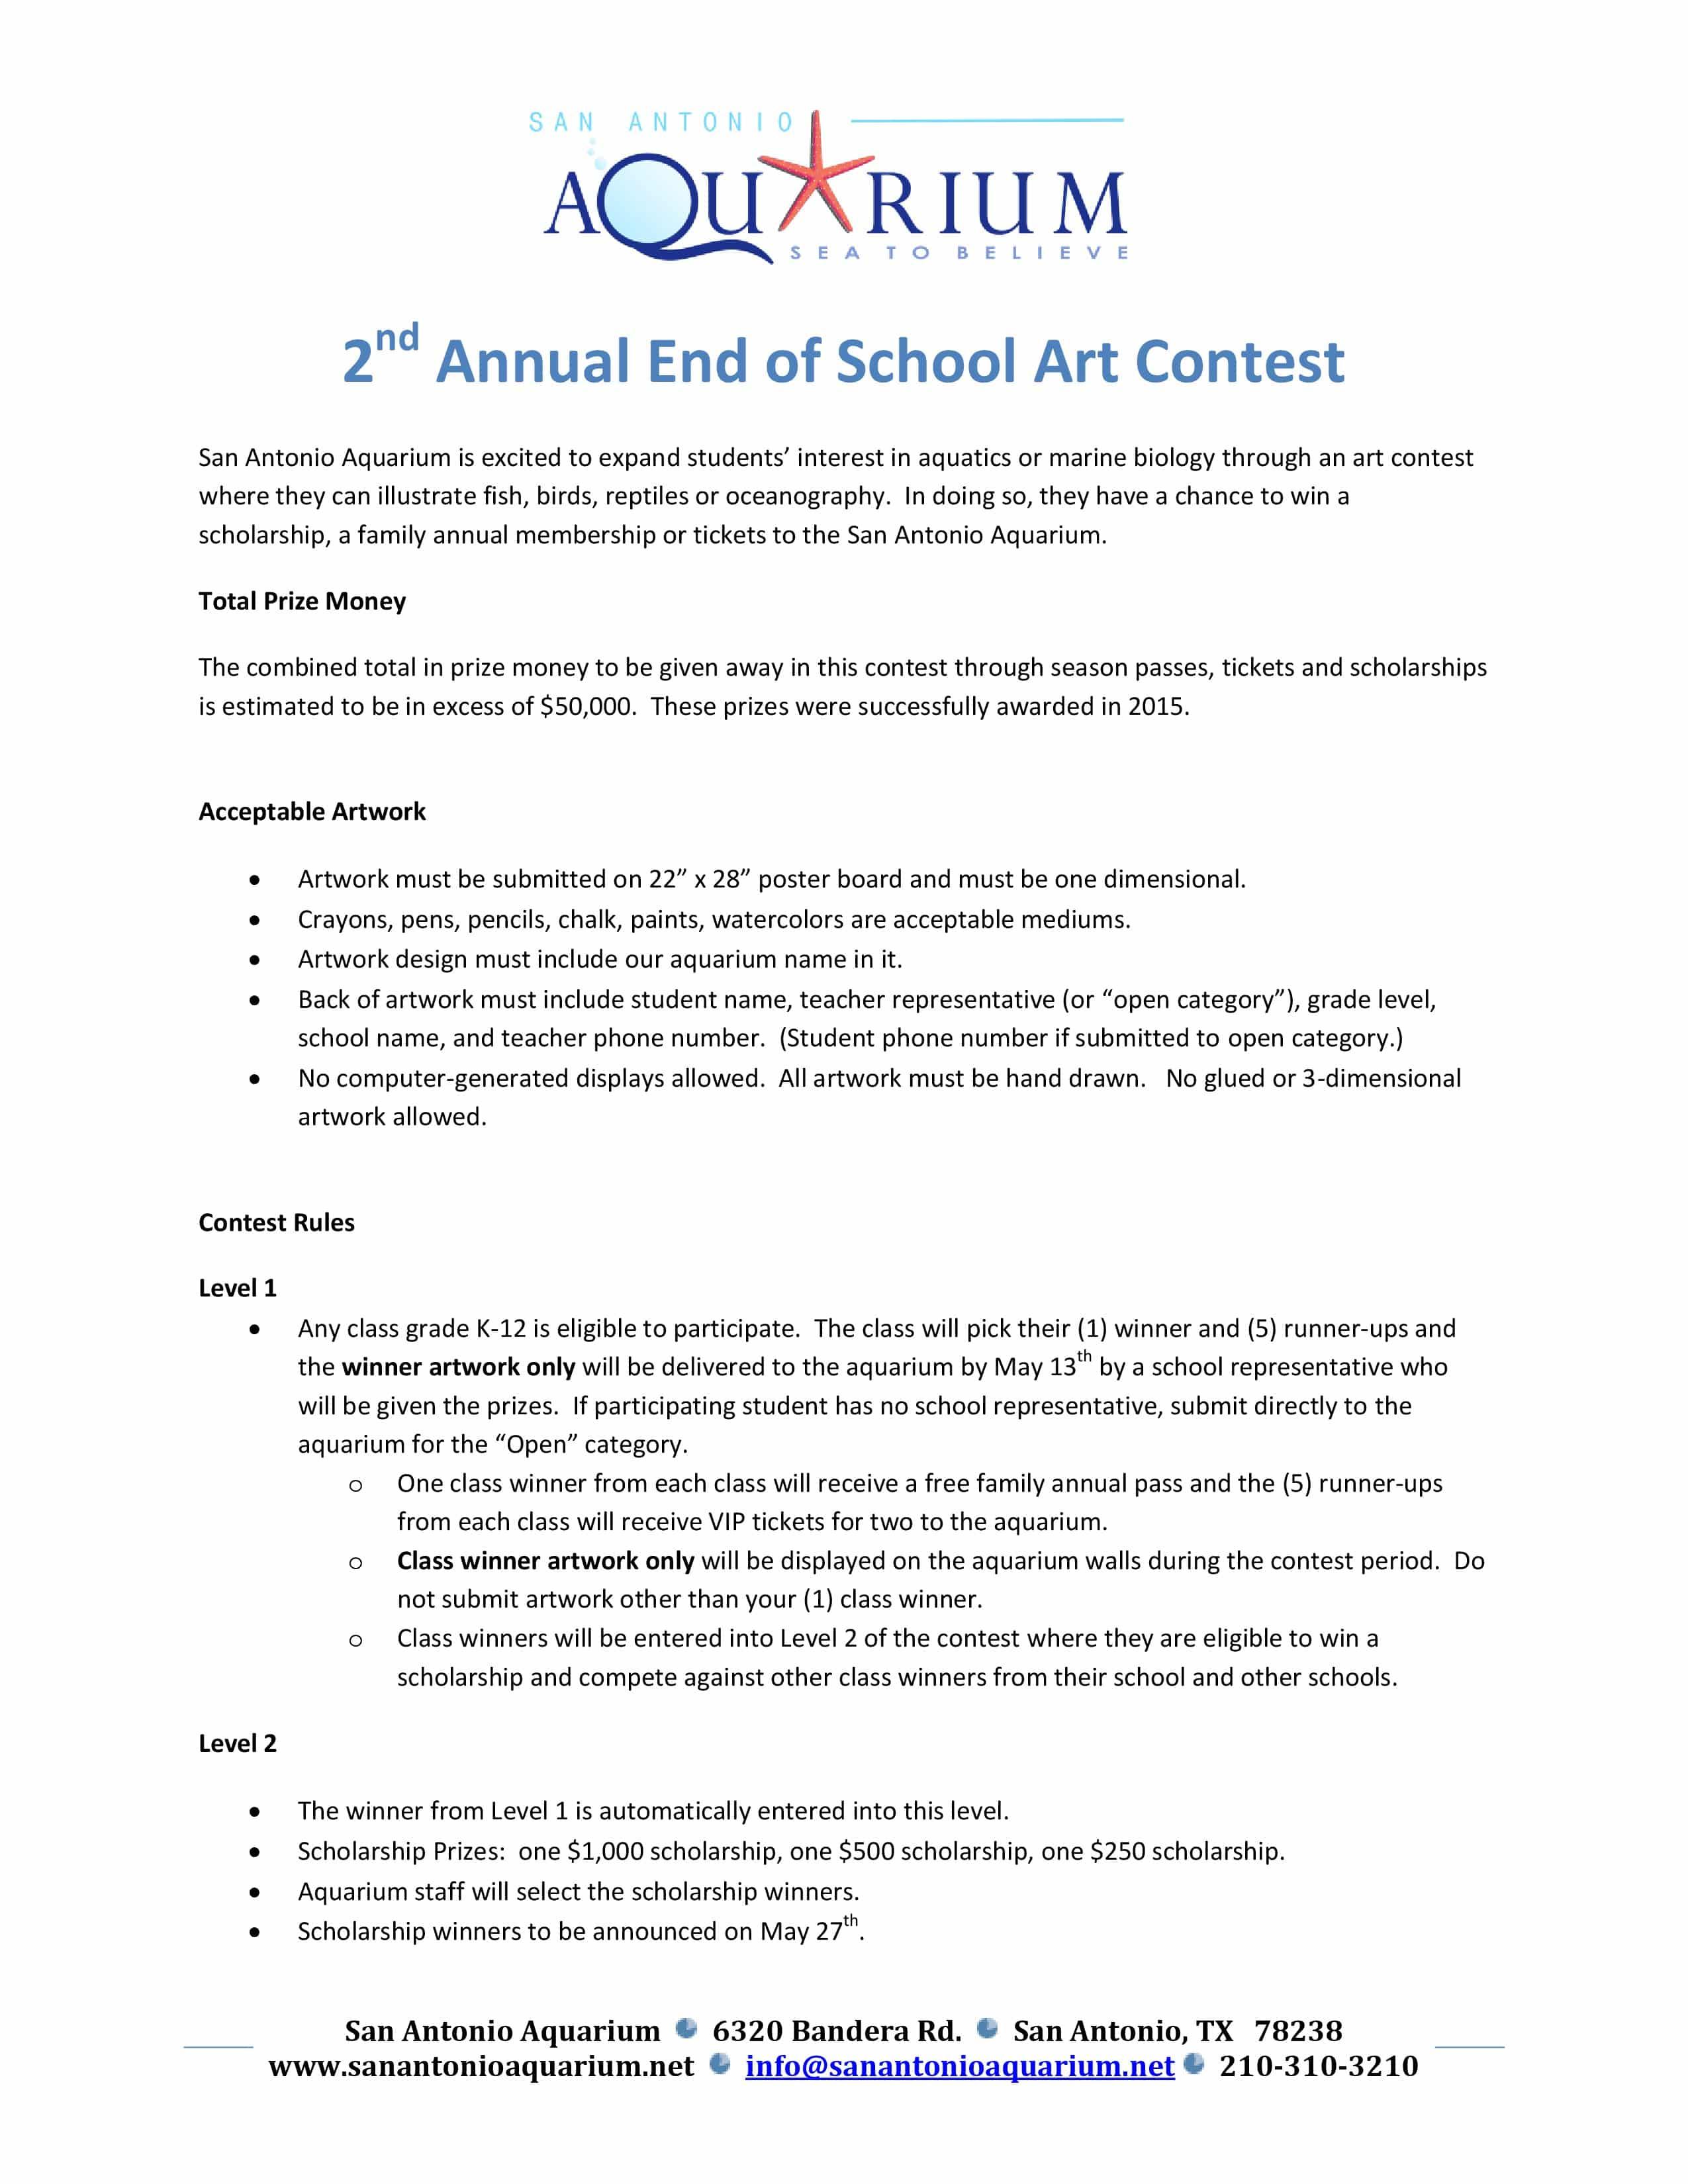 End of School Art Contest School Scholarship Artwork Contest-SAA-2016